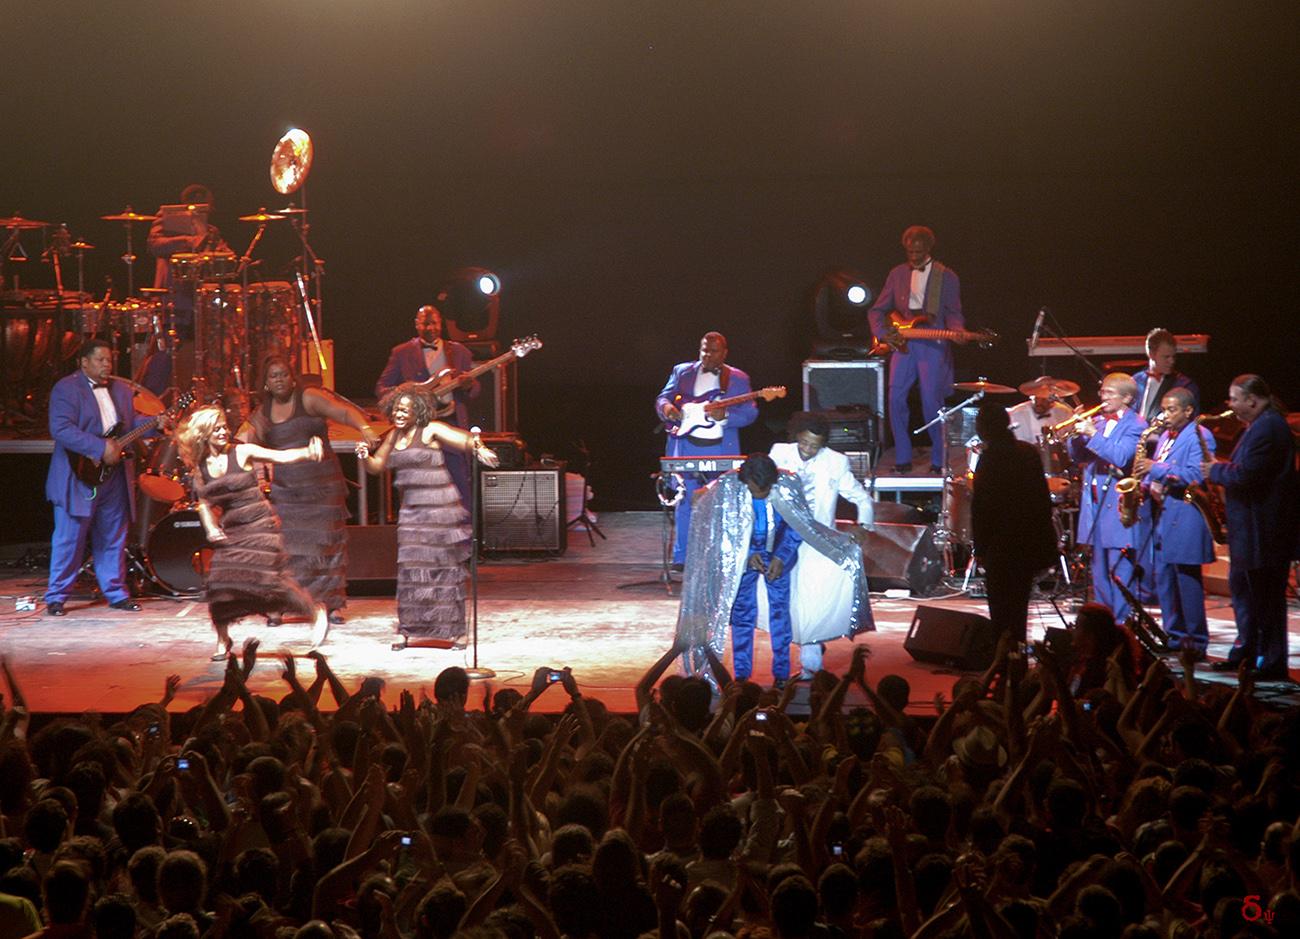 James Brown live concert 2006 at Lycabettus Athens